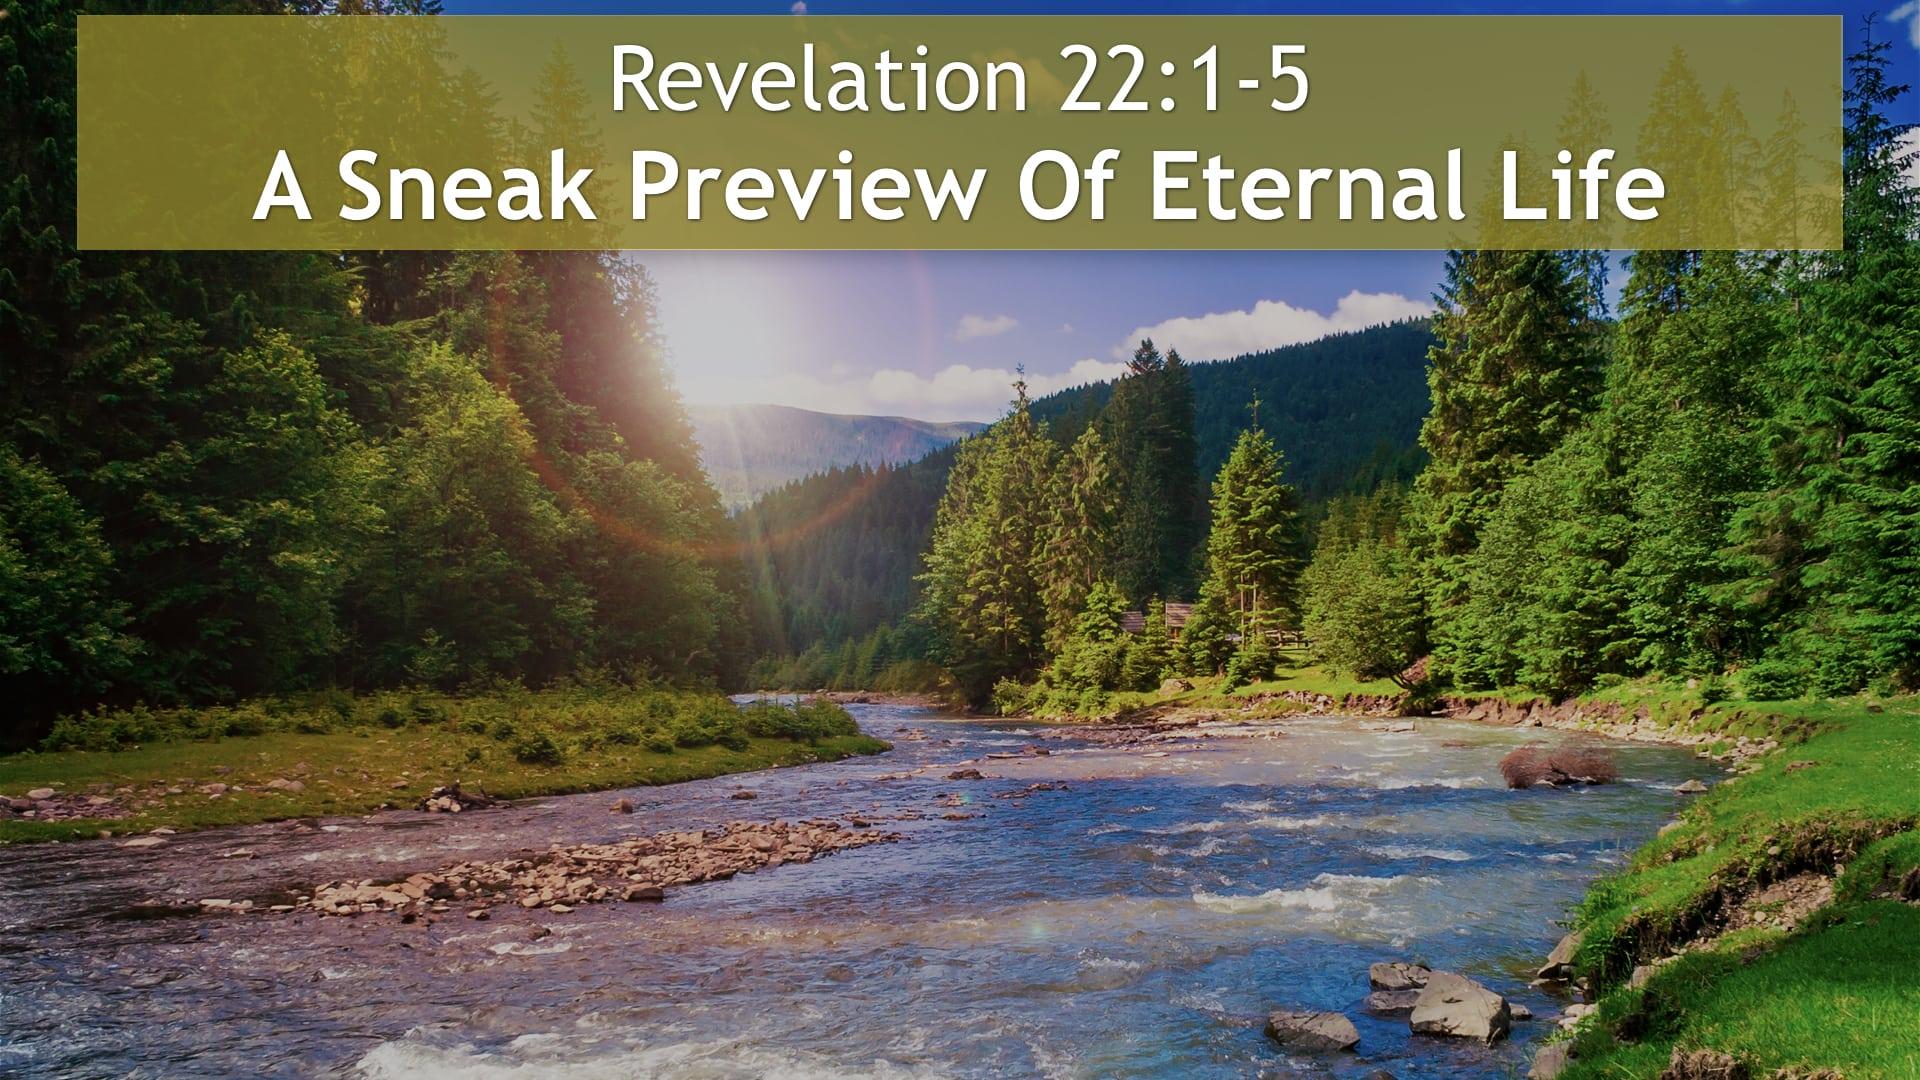 Revelation 22, A Sneak Preview Of Eternal Life - Living Water Church